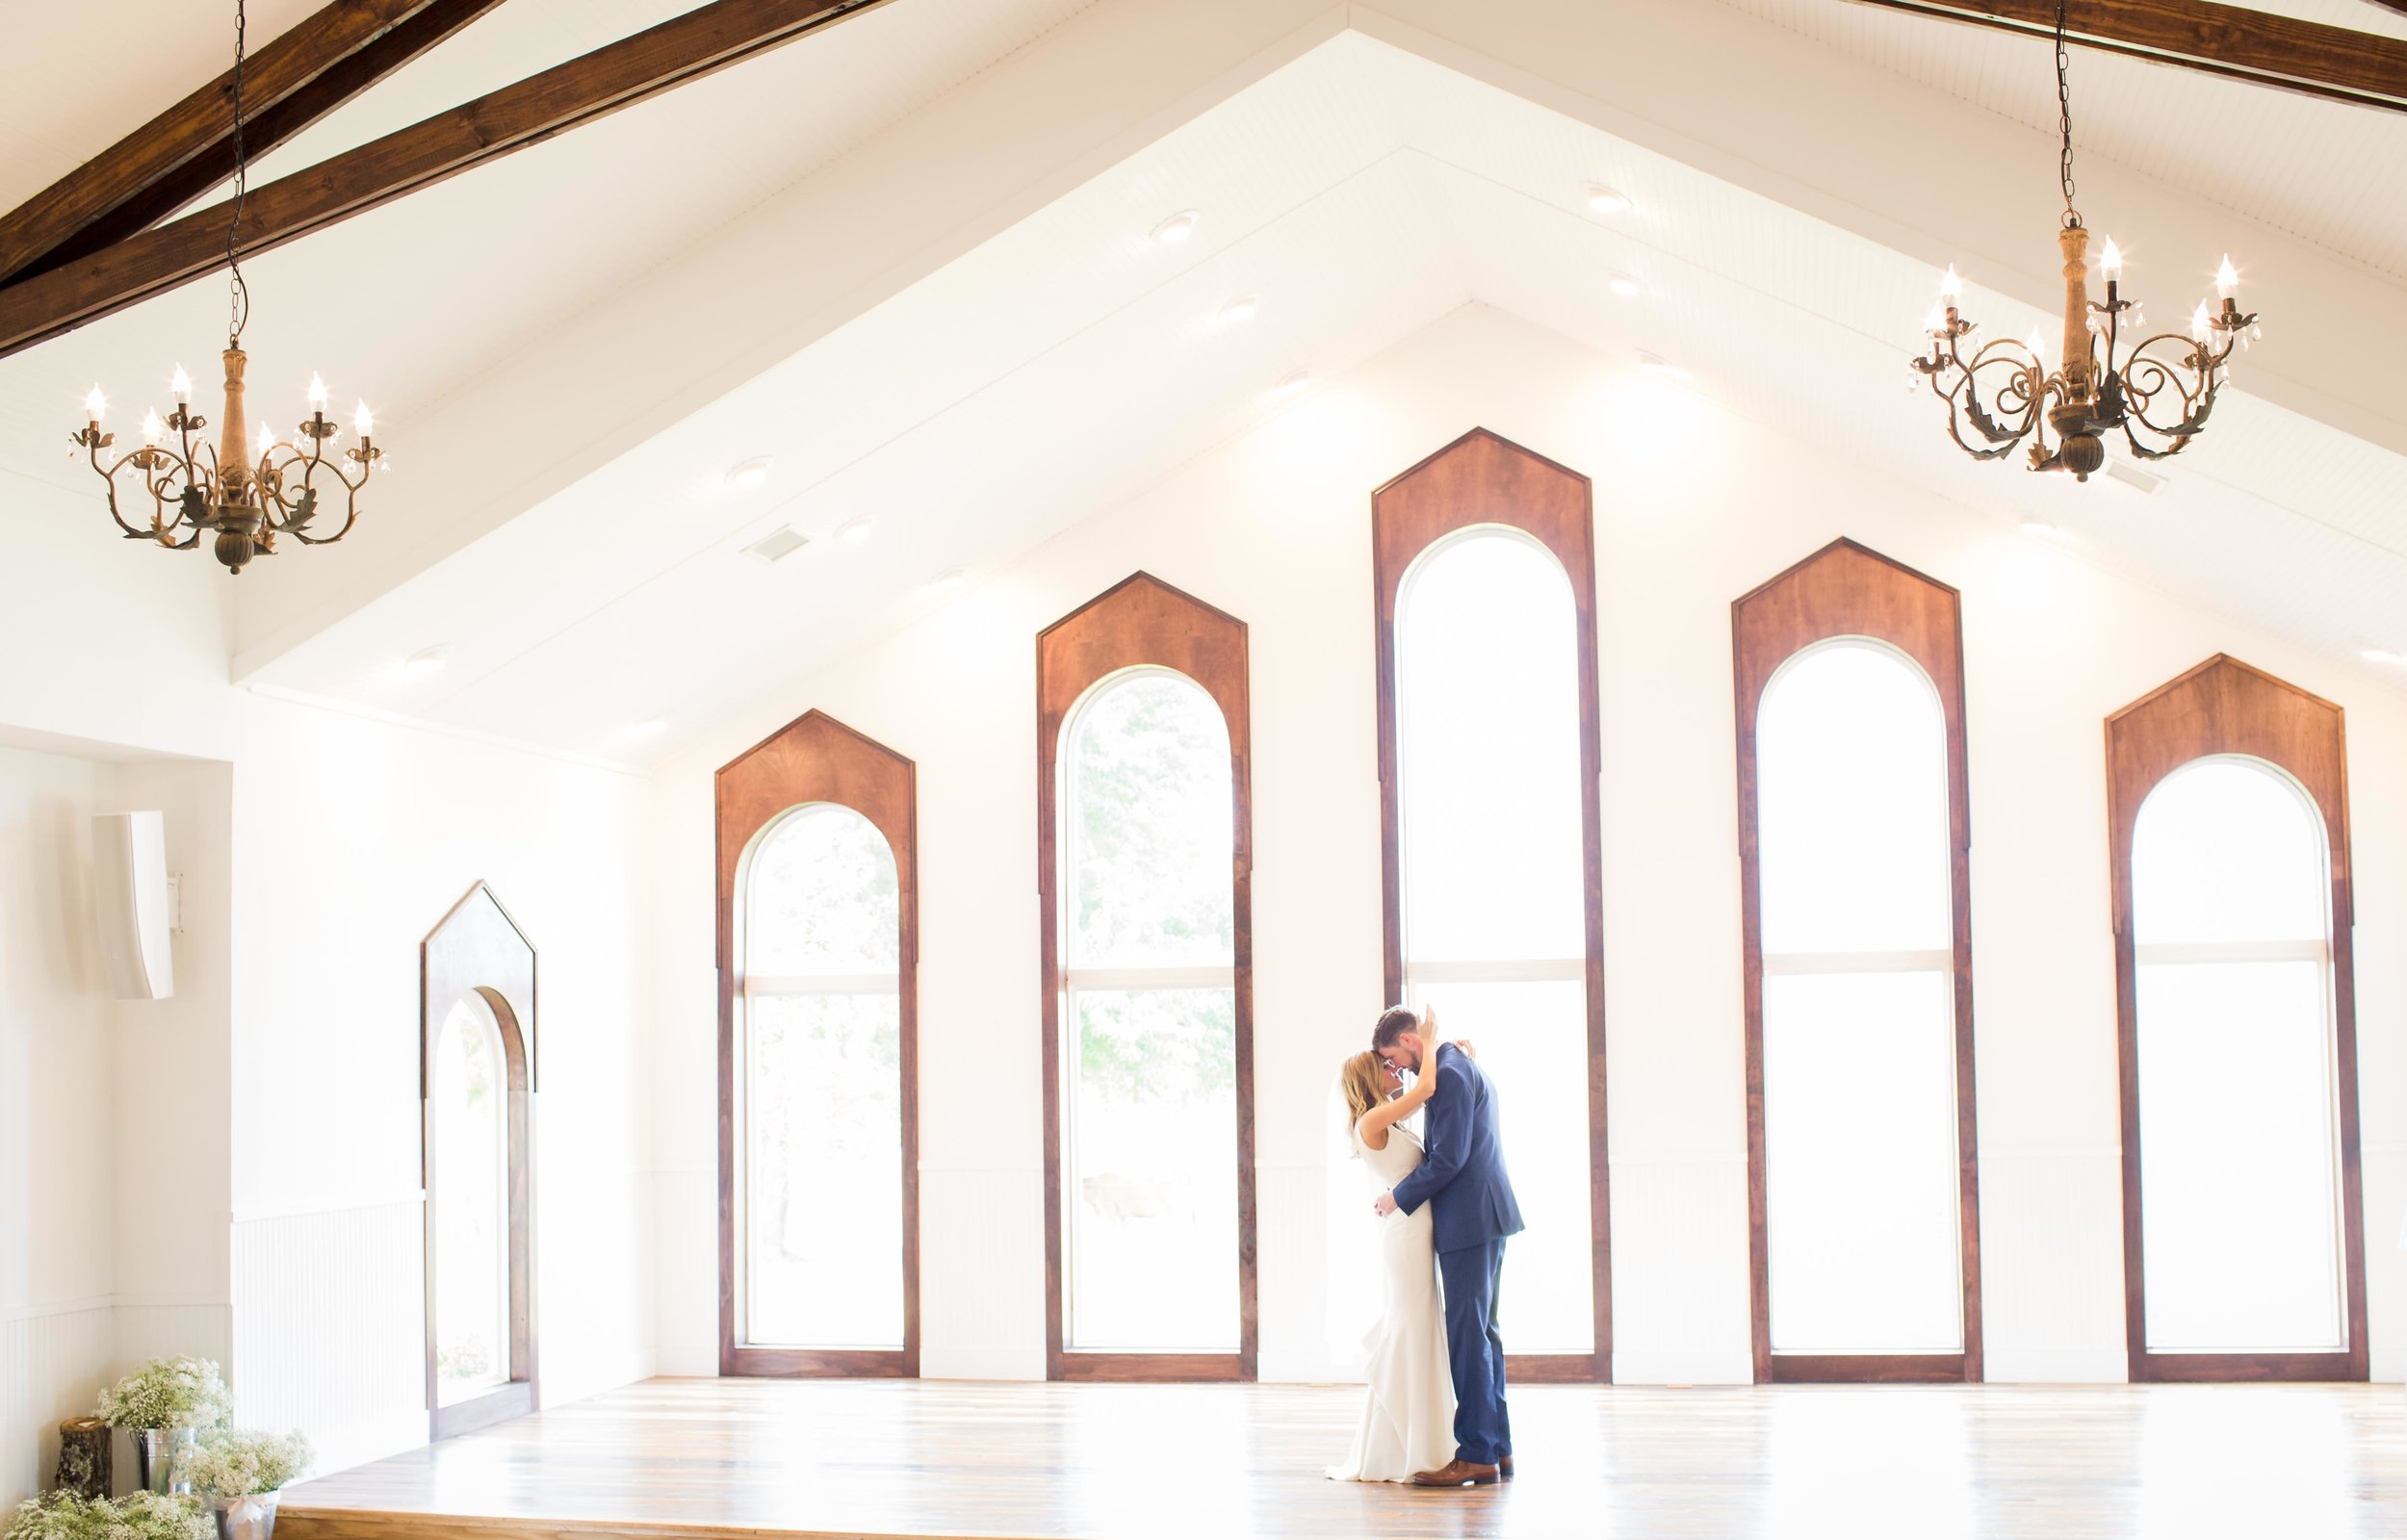 Chad+Monica_Wedding_AbrahannyPhotography-1048.jpg